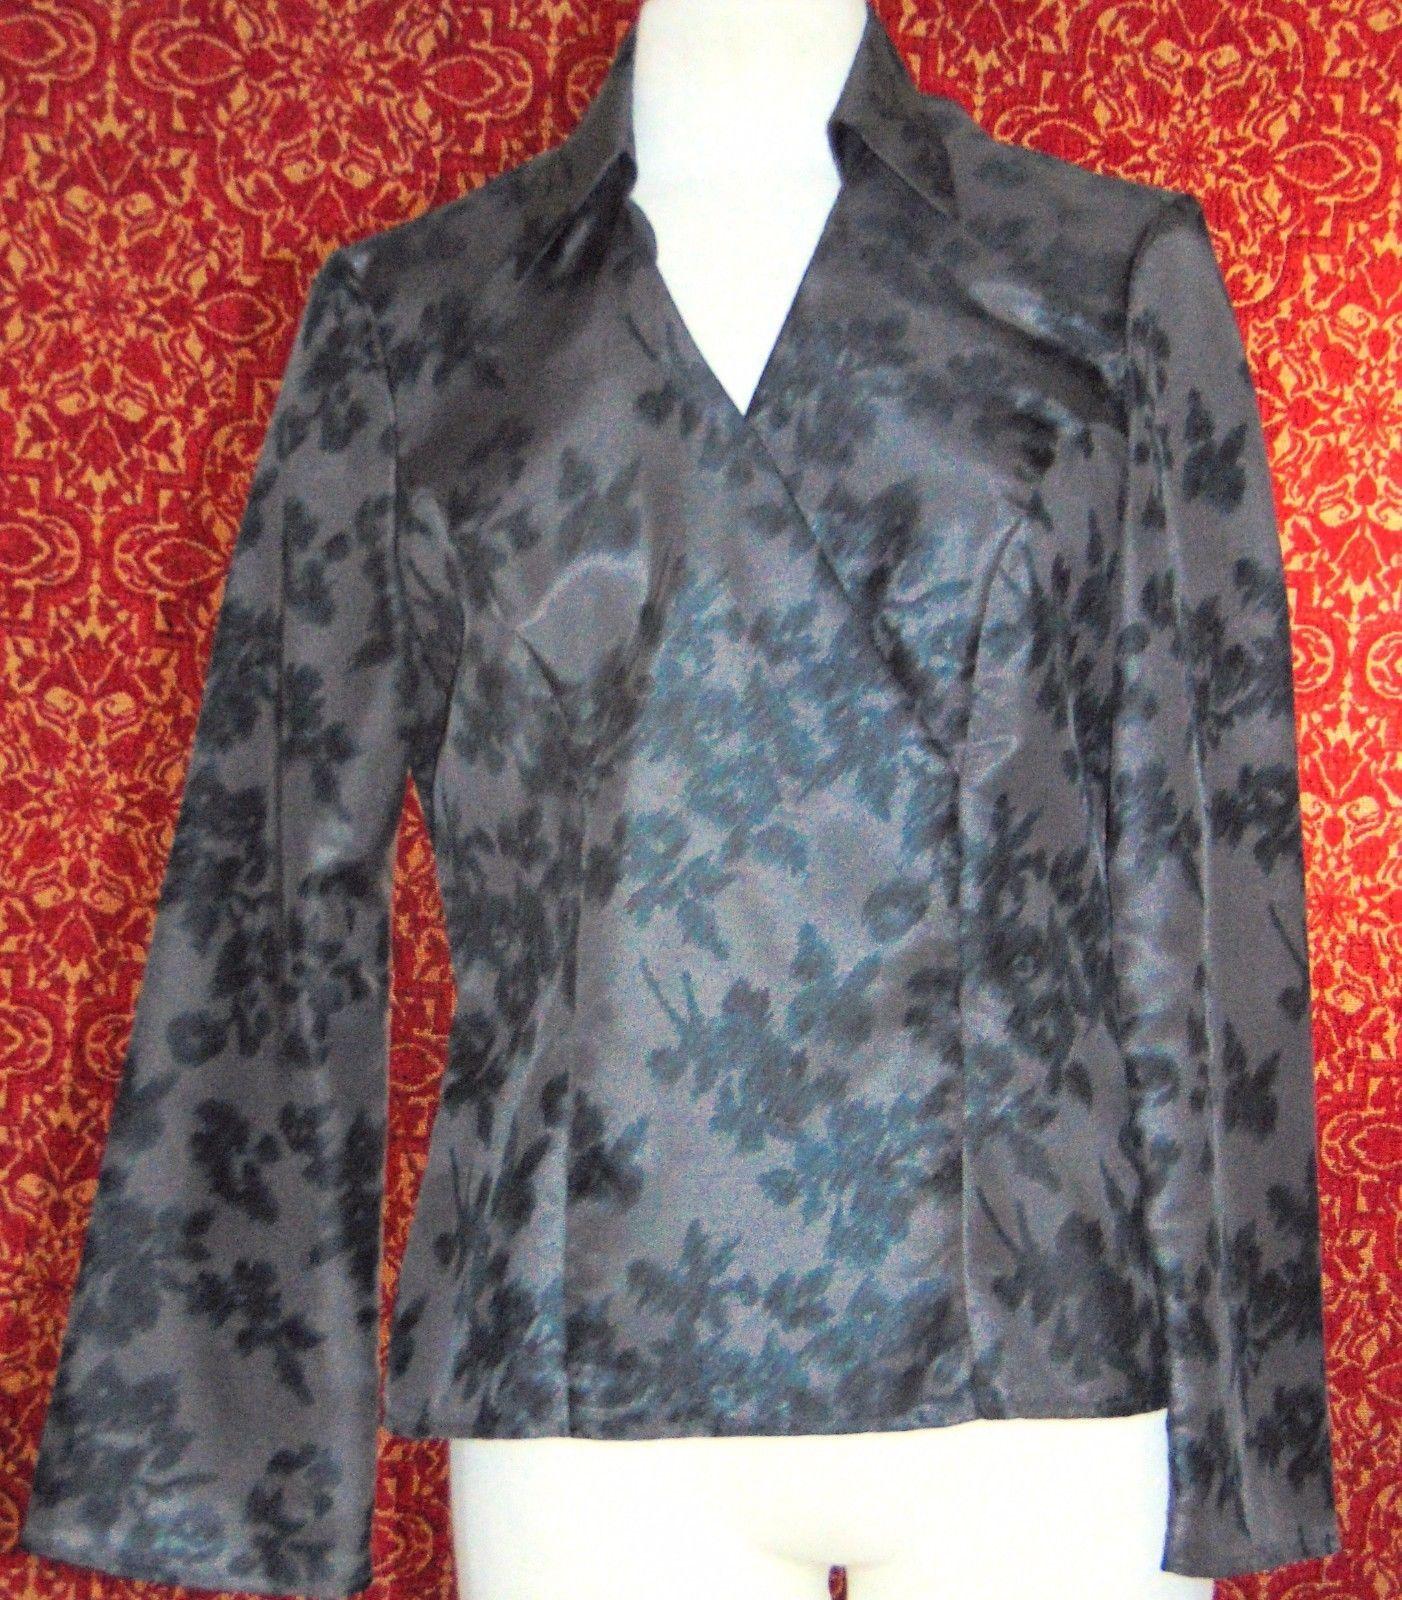 NINE & COMPANY gray polyester long sleeve faux wrap blouse 6 (T07-01I8G) image 6